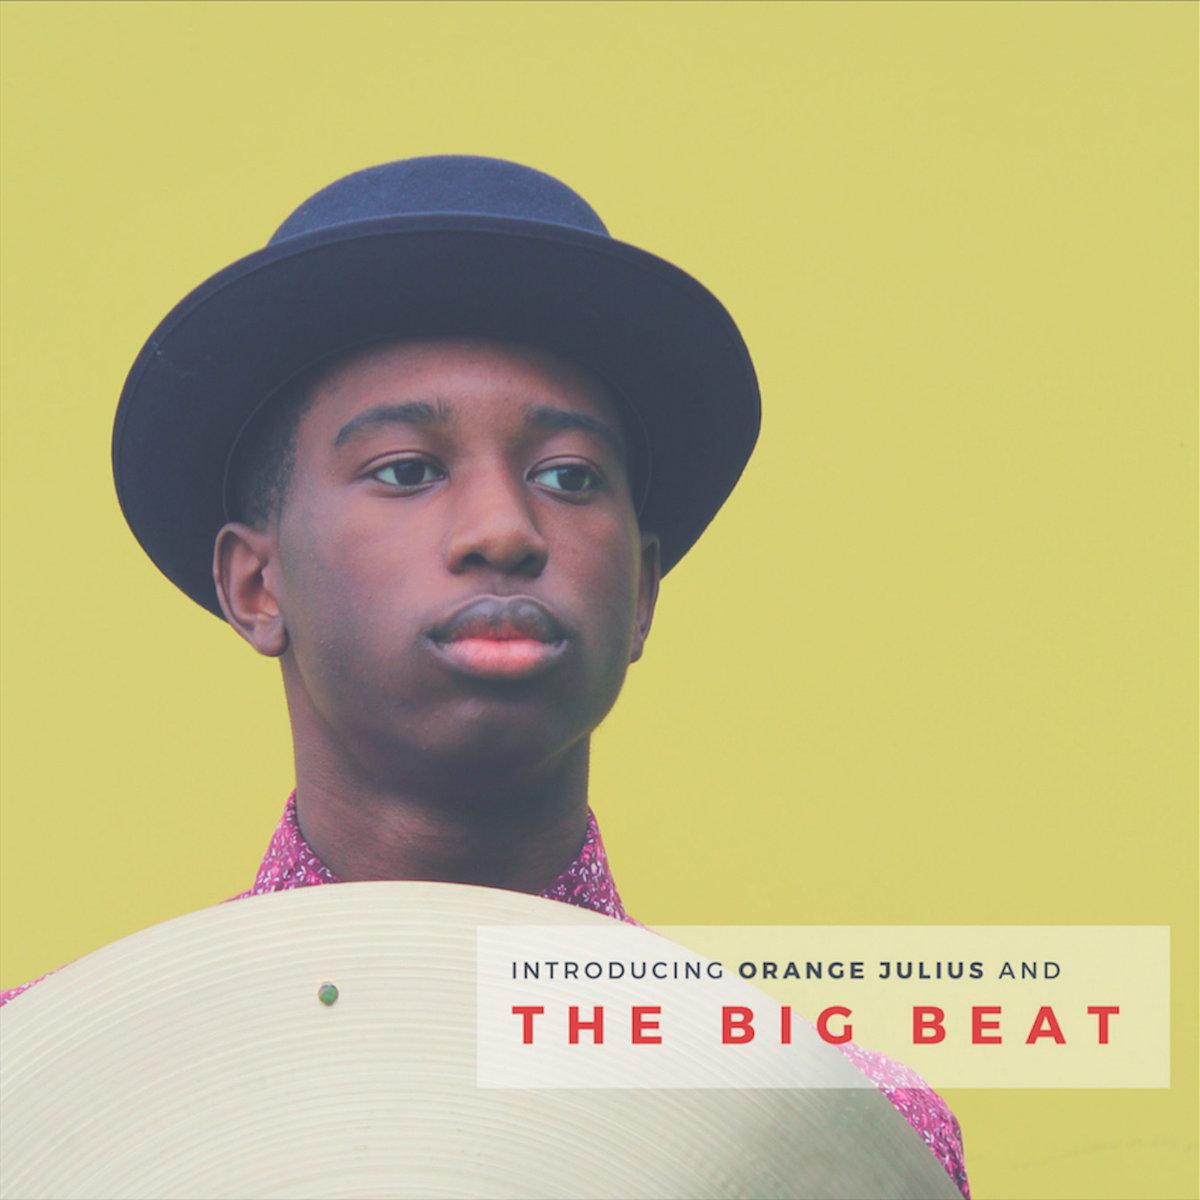 Introducing Orange Julius and the Big Beat: Orange Julius and the Big Beat